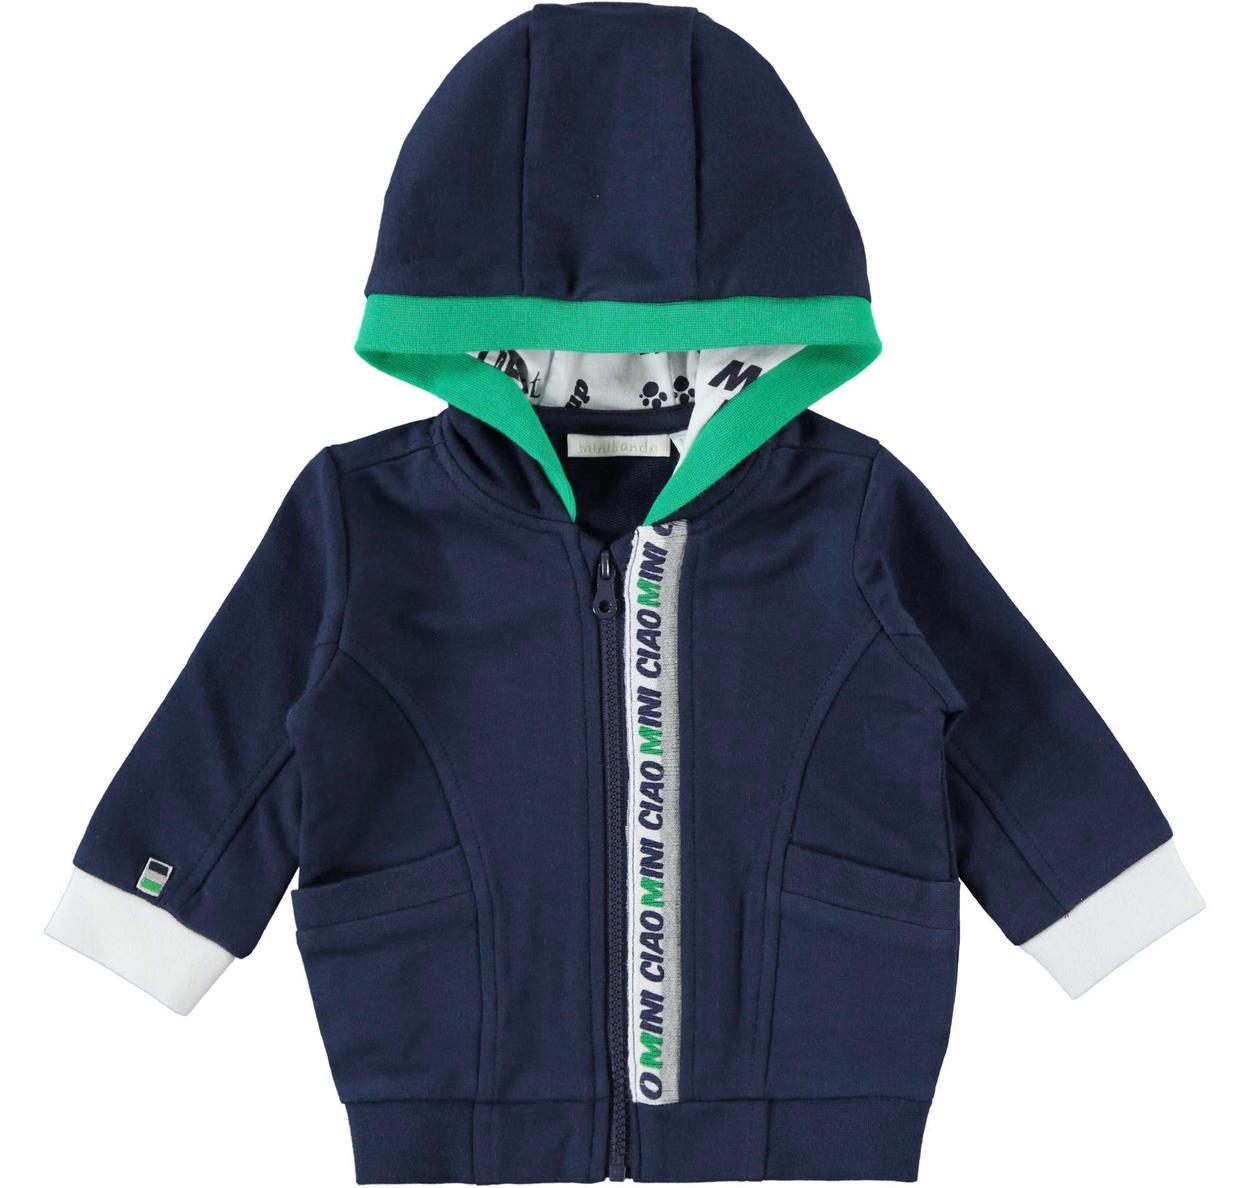 online retailer b5488 fb6a9 Comoda felpa a manica lunga con cappuccio per neonato da 0 a 24 mesi  Minibanda